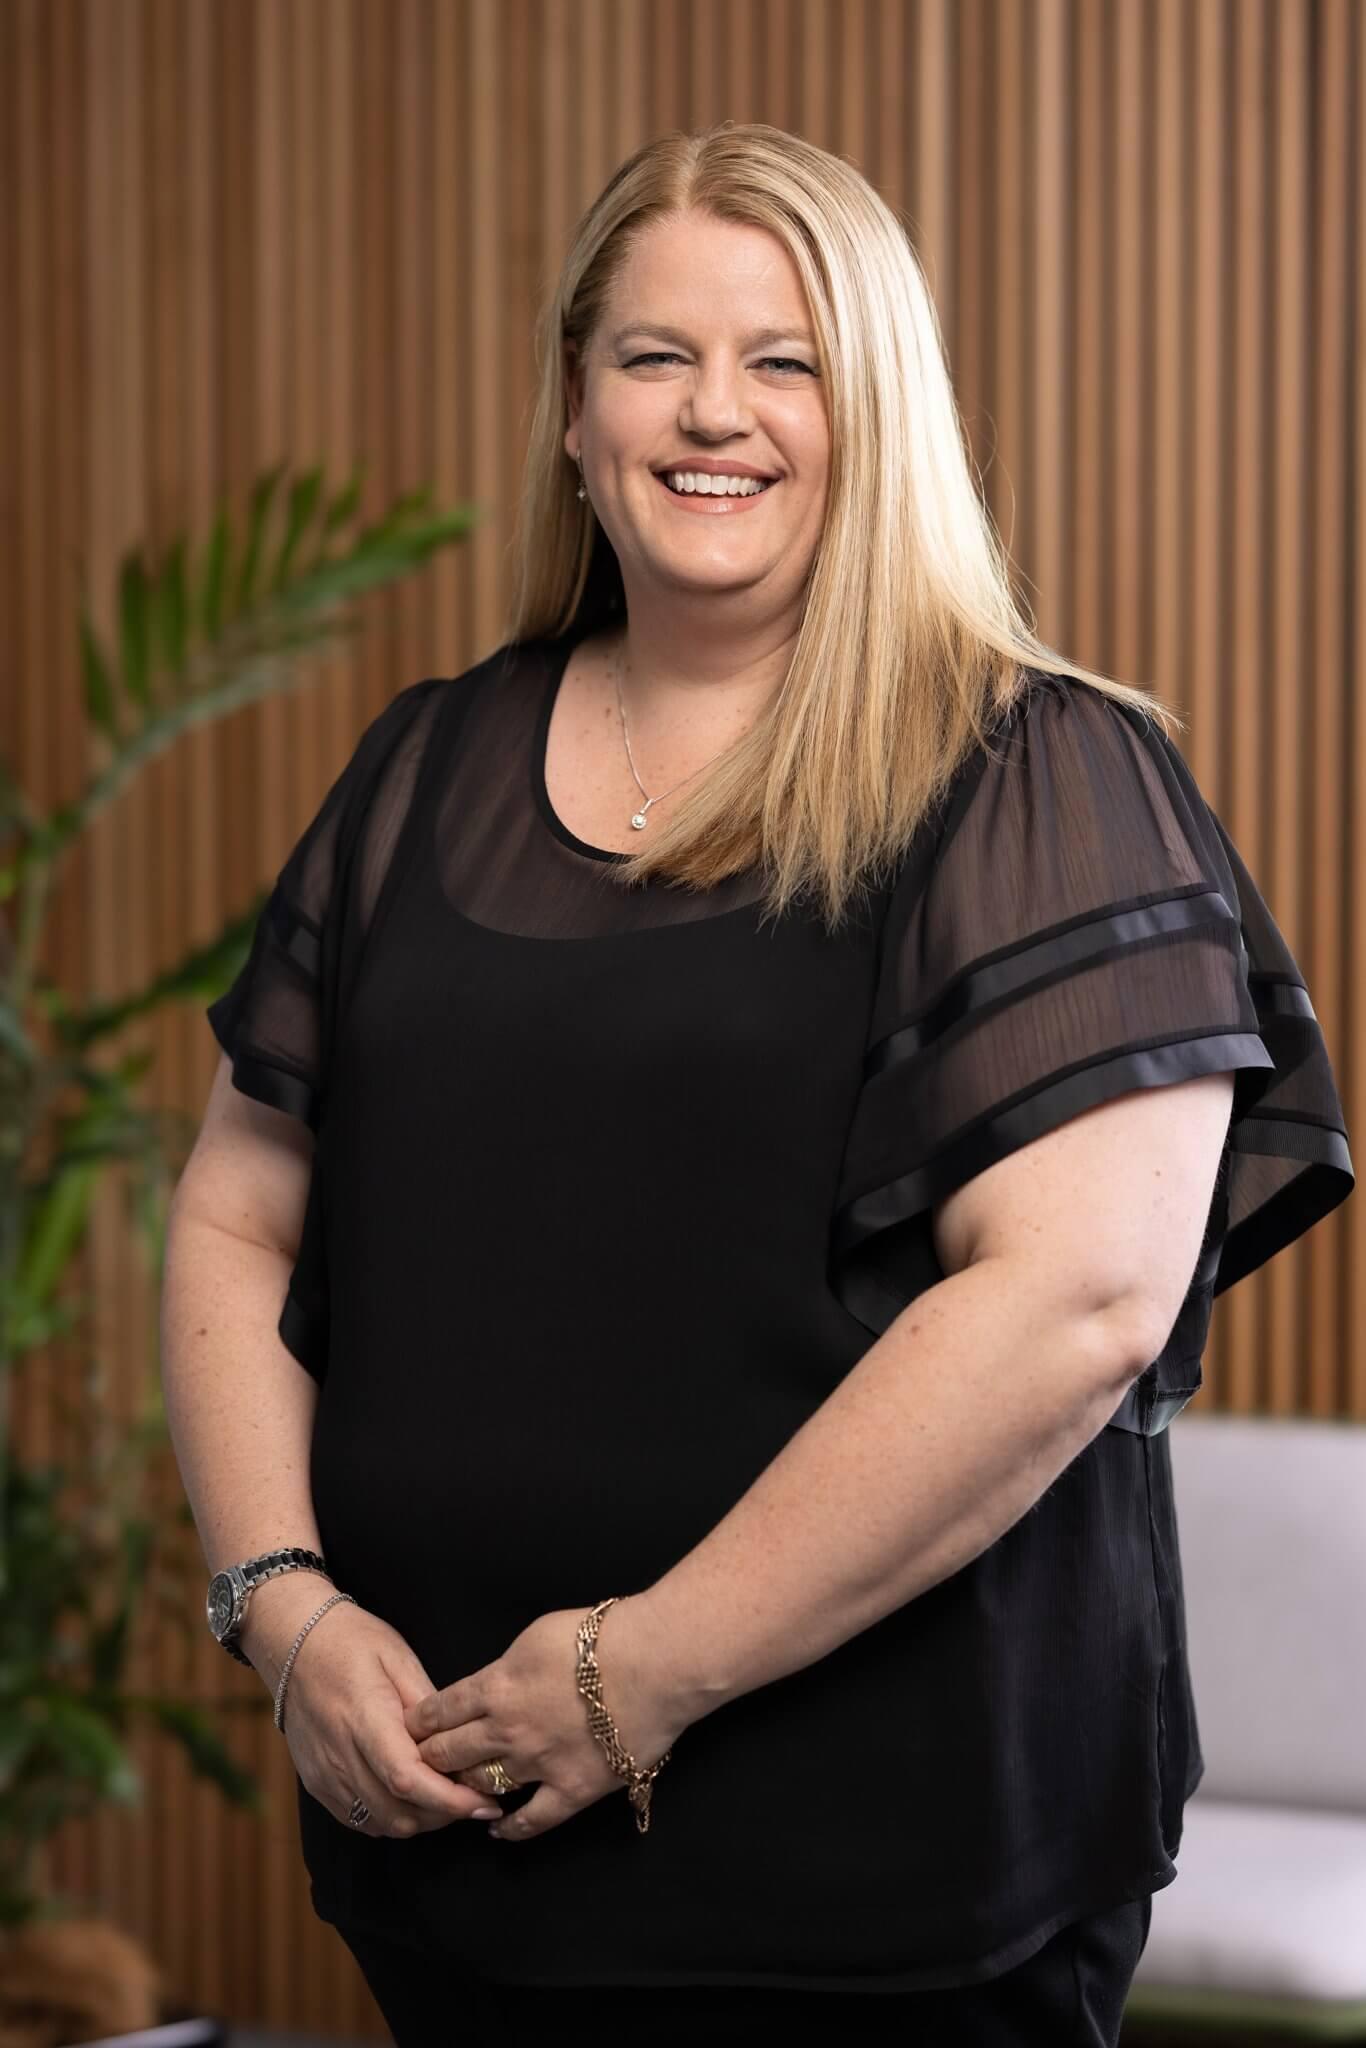 Michelle Loughhead